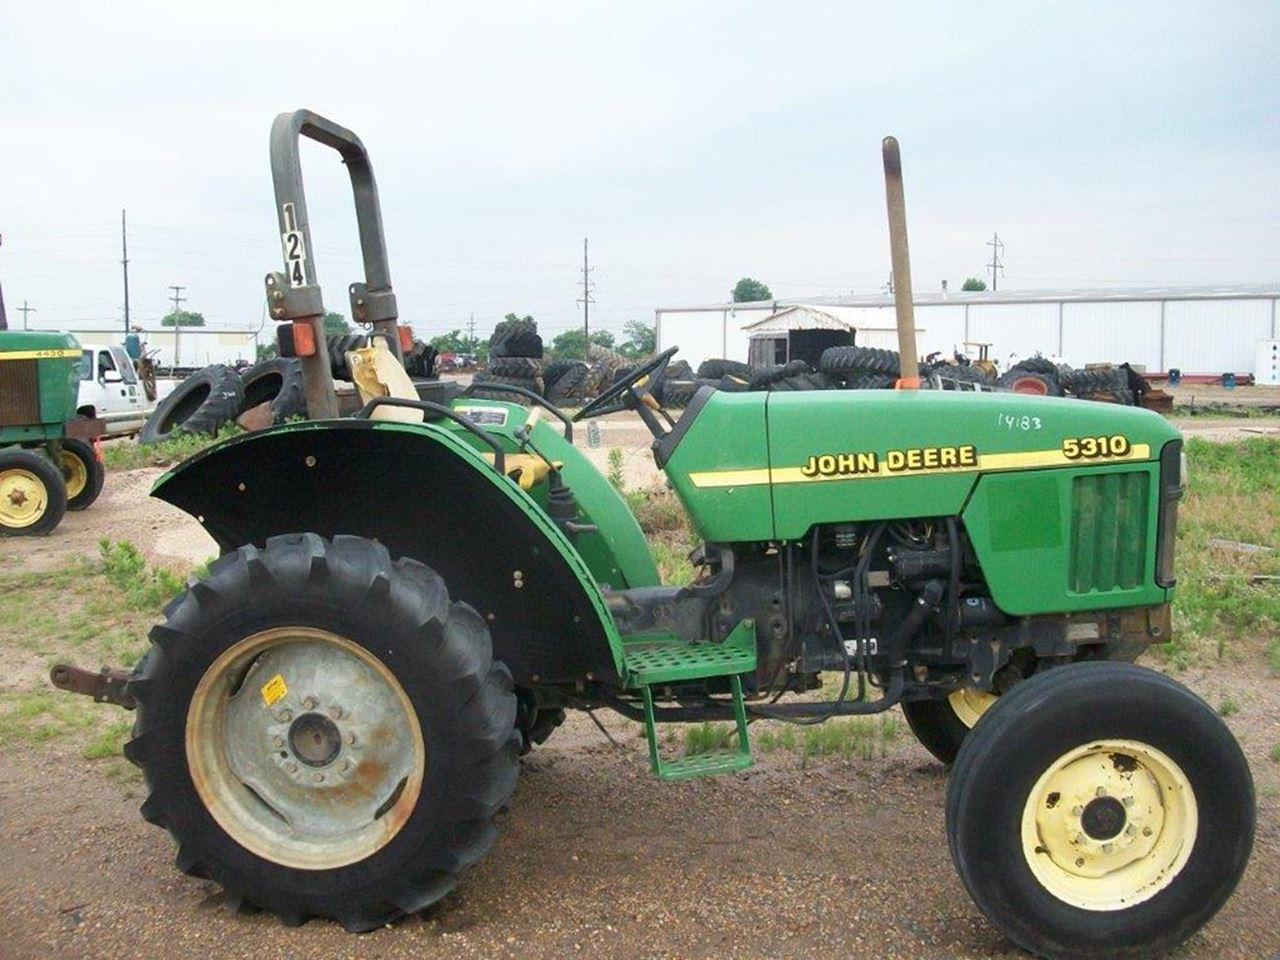 John Deere Tractor 5310 | Worthington Ag Parts